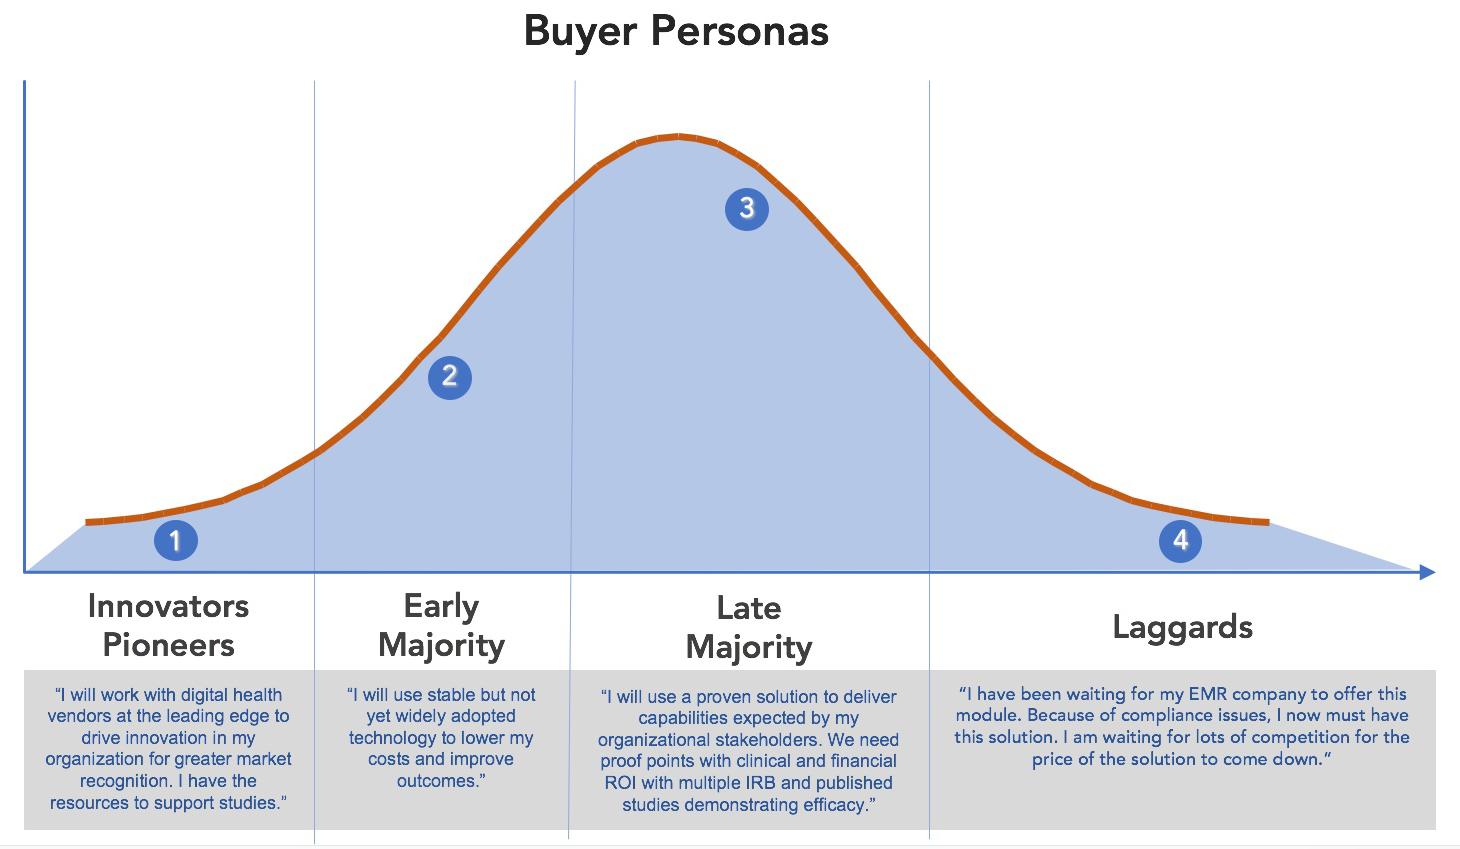 Buyer Personas Adoption Curve